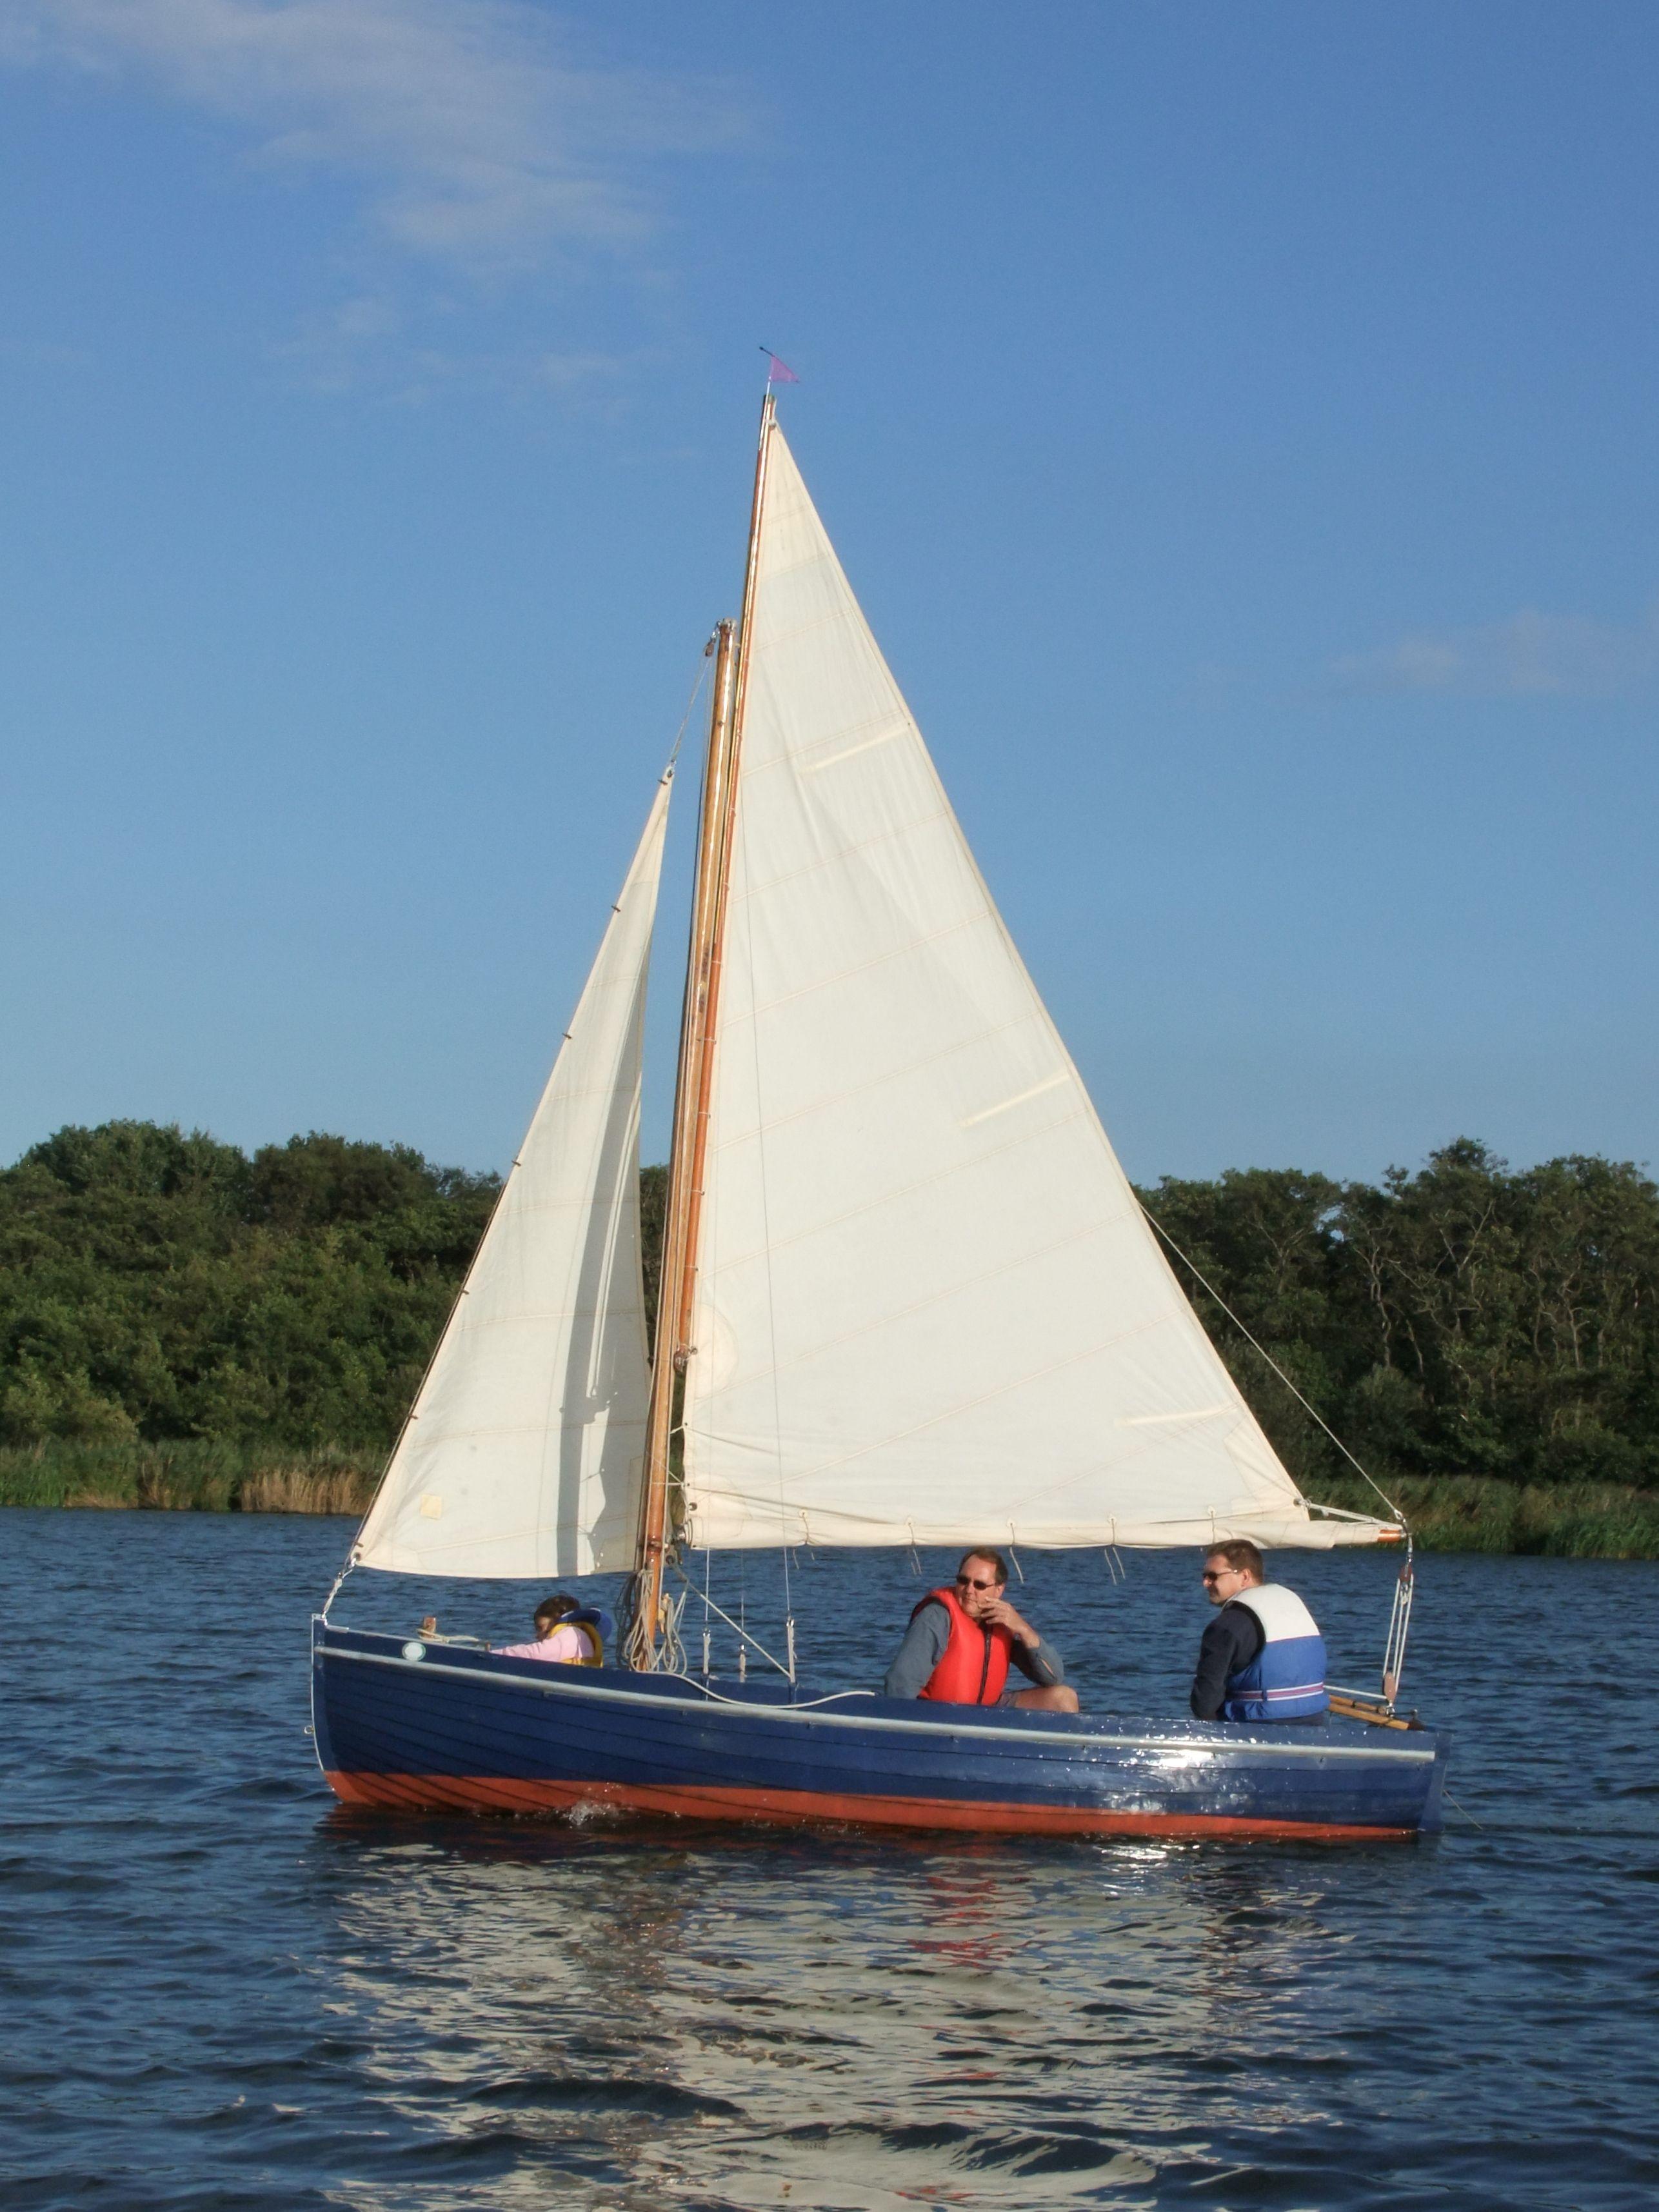 On Barton Broad 11 RNSA dinghy sails byjpg 25723429